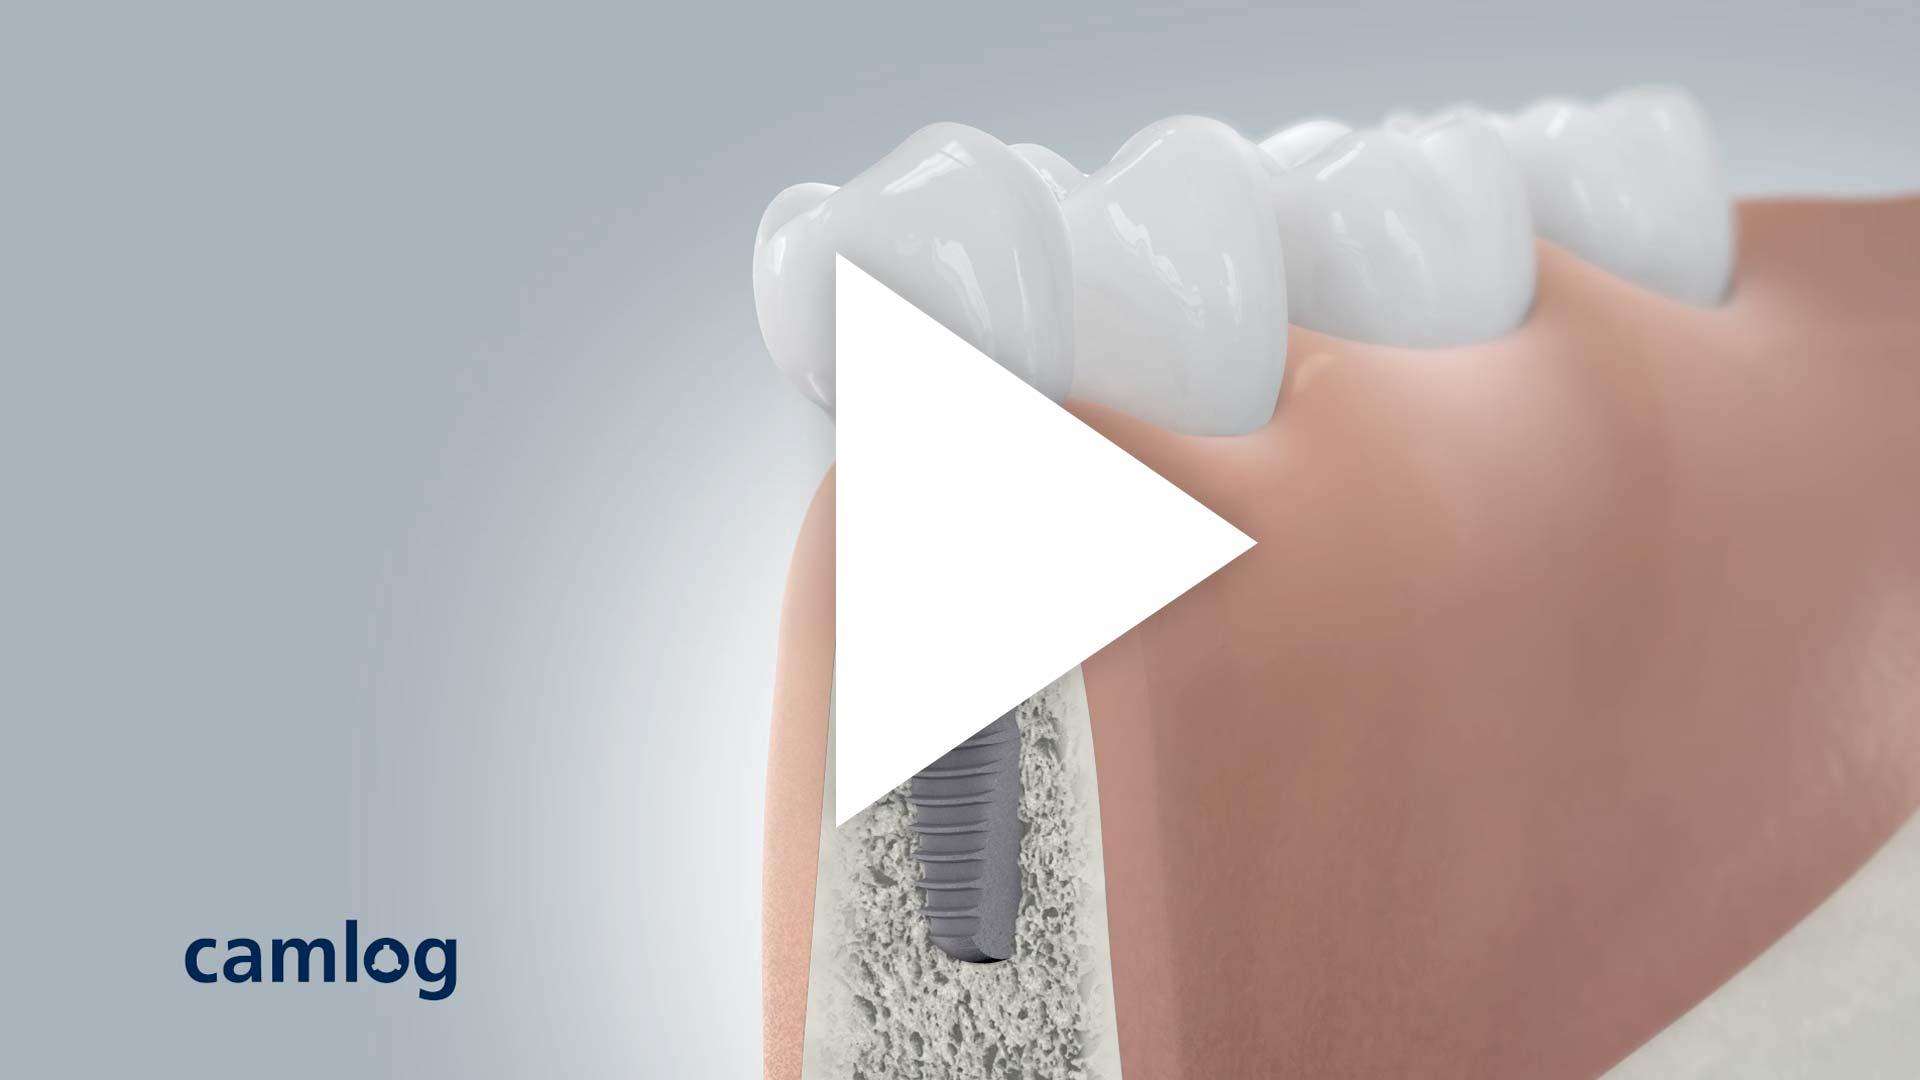 CAMLOG 3D Implantation